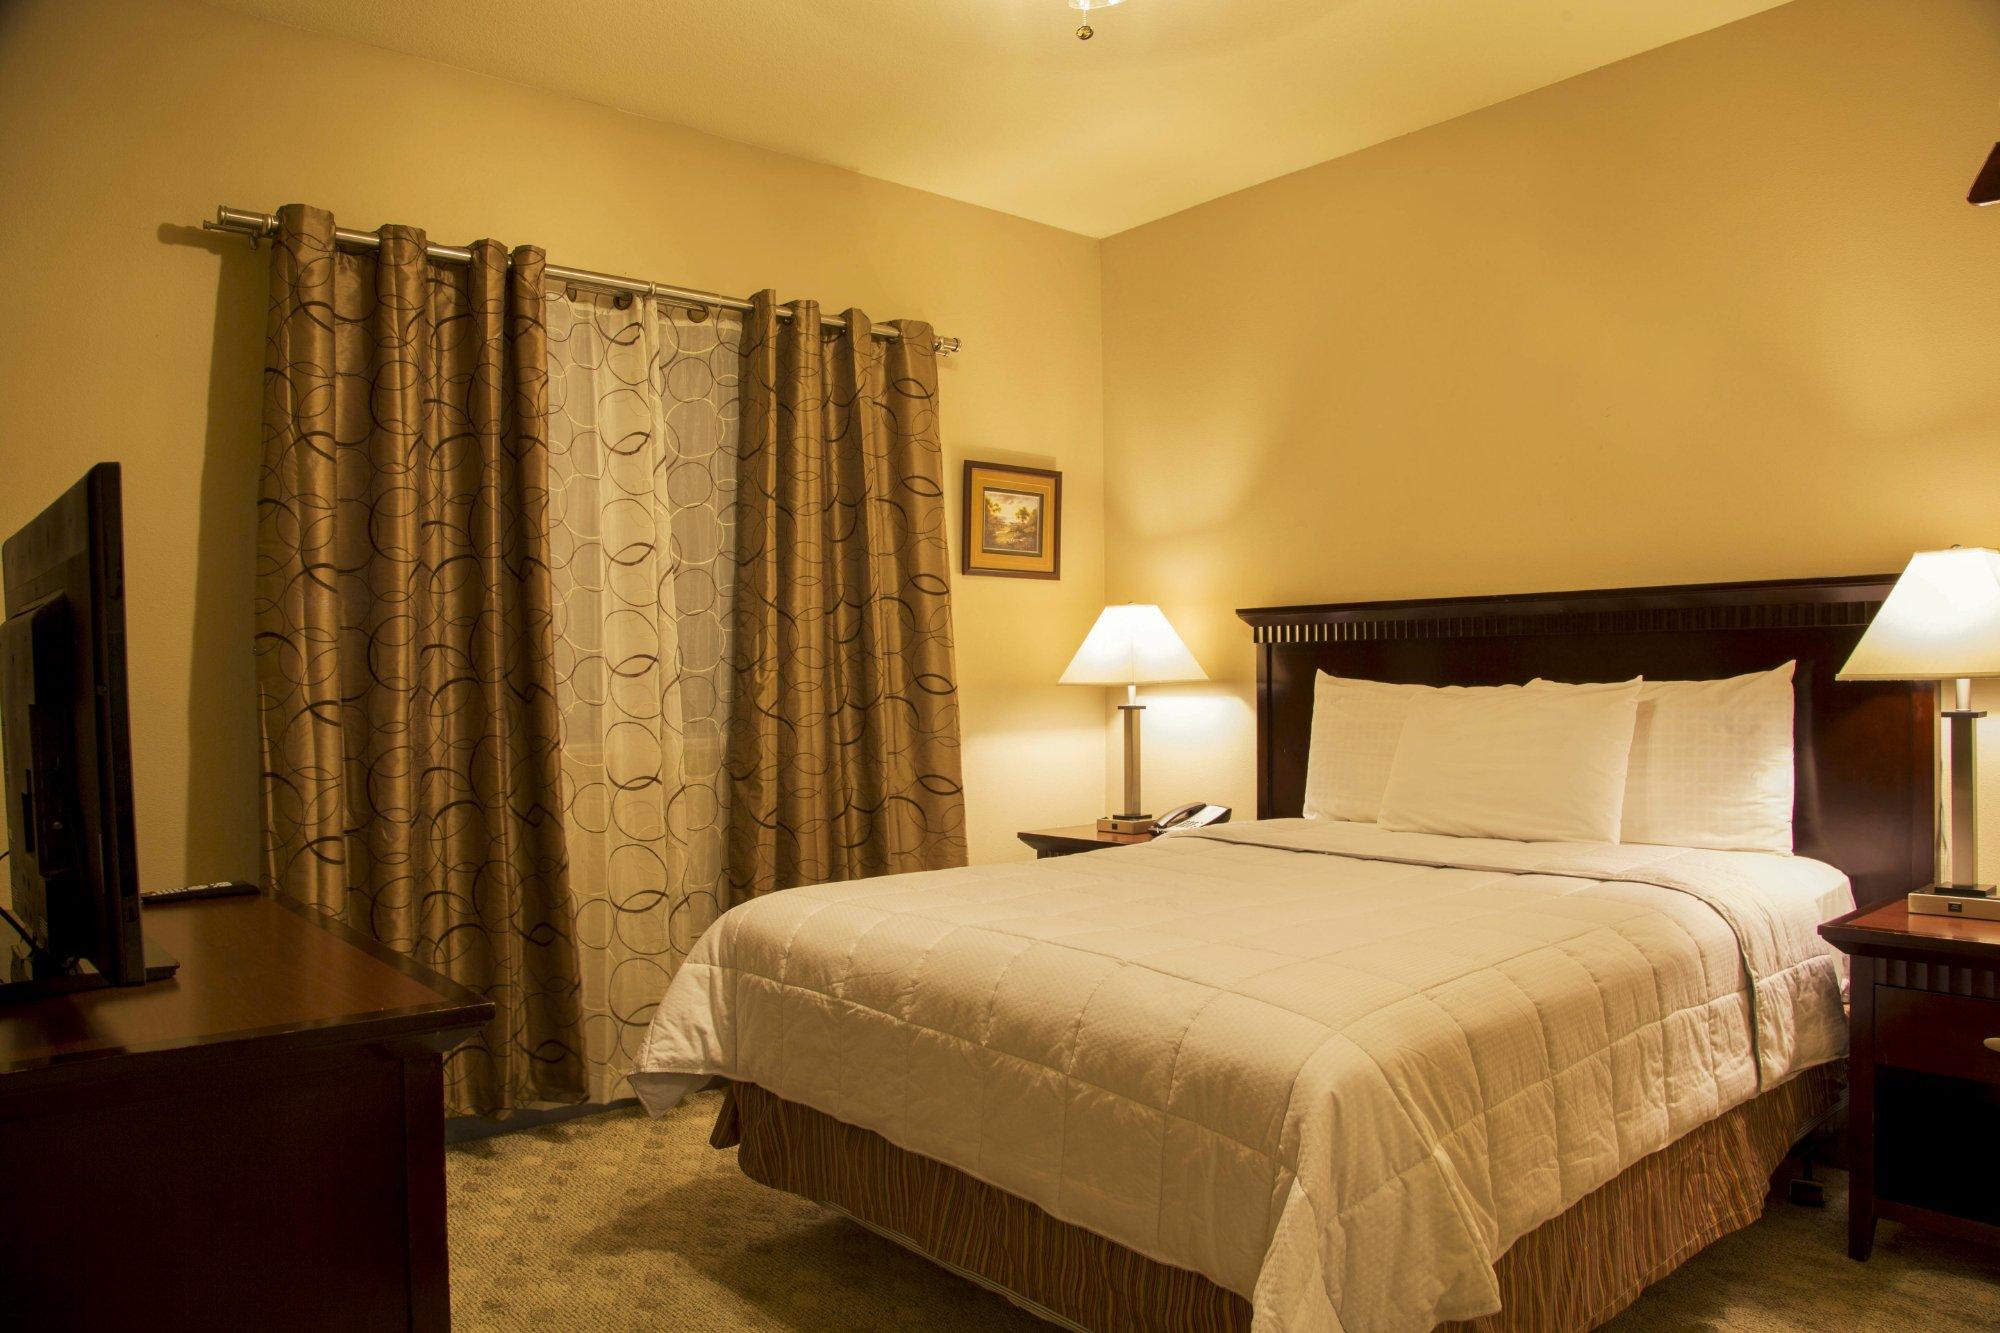 Brawley Inn Hotel Amp Conference Center Updated 2017 Reviews Amp Price Comparison Ca Tripadvisor